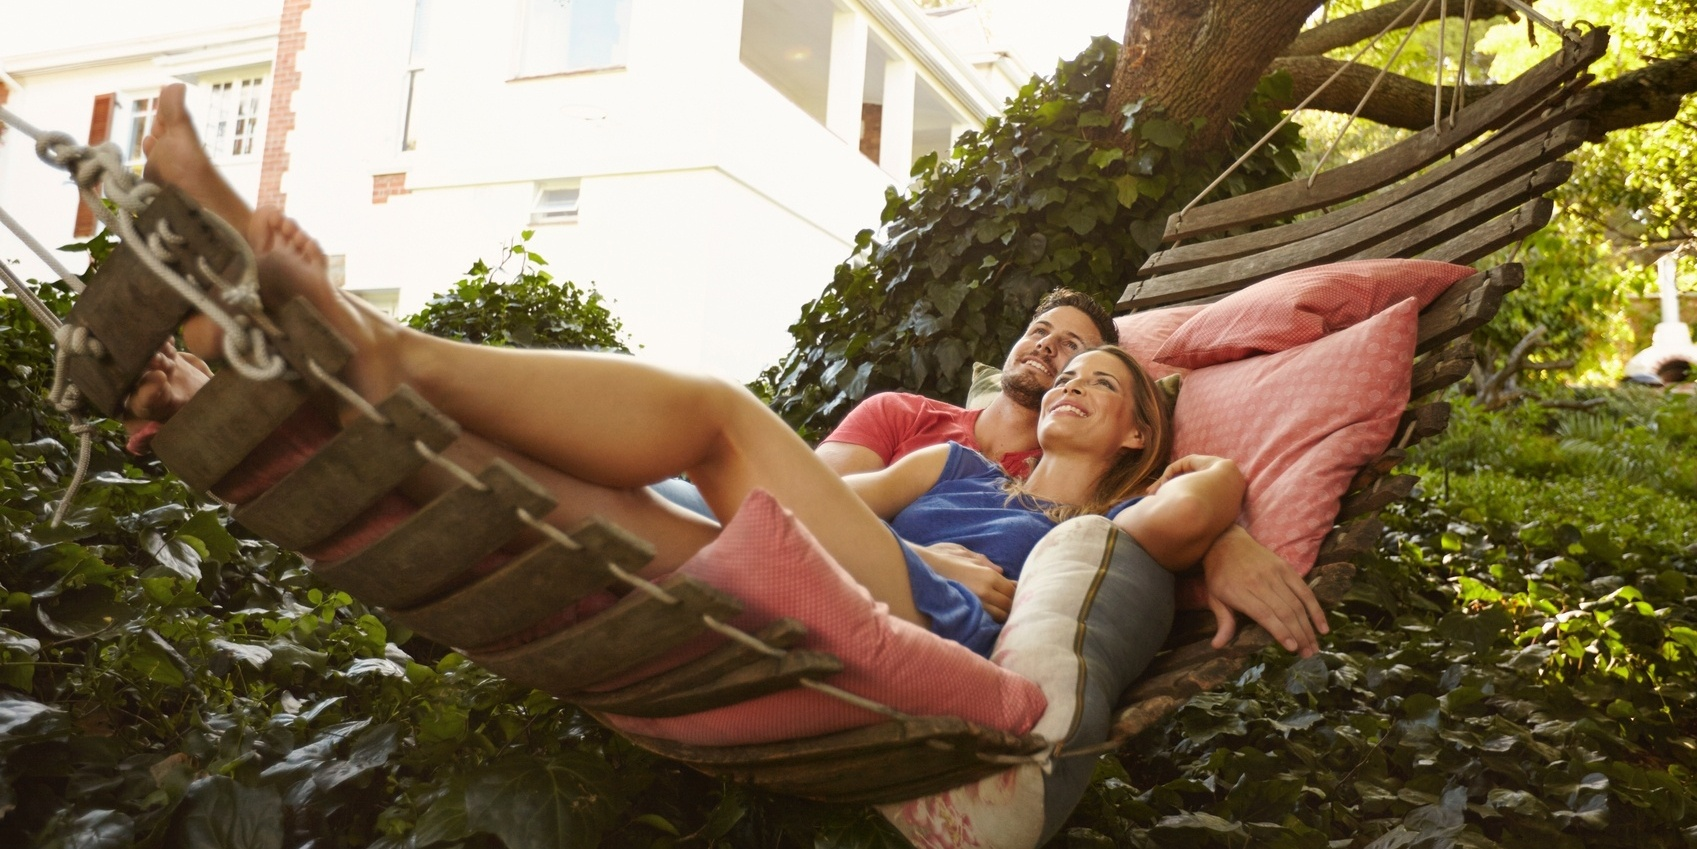 backyard-fun-hammock.jpg